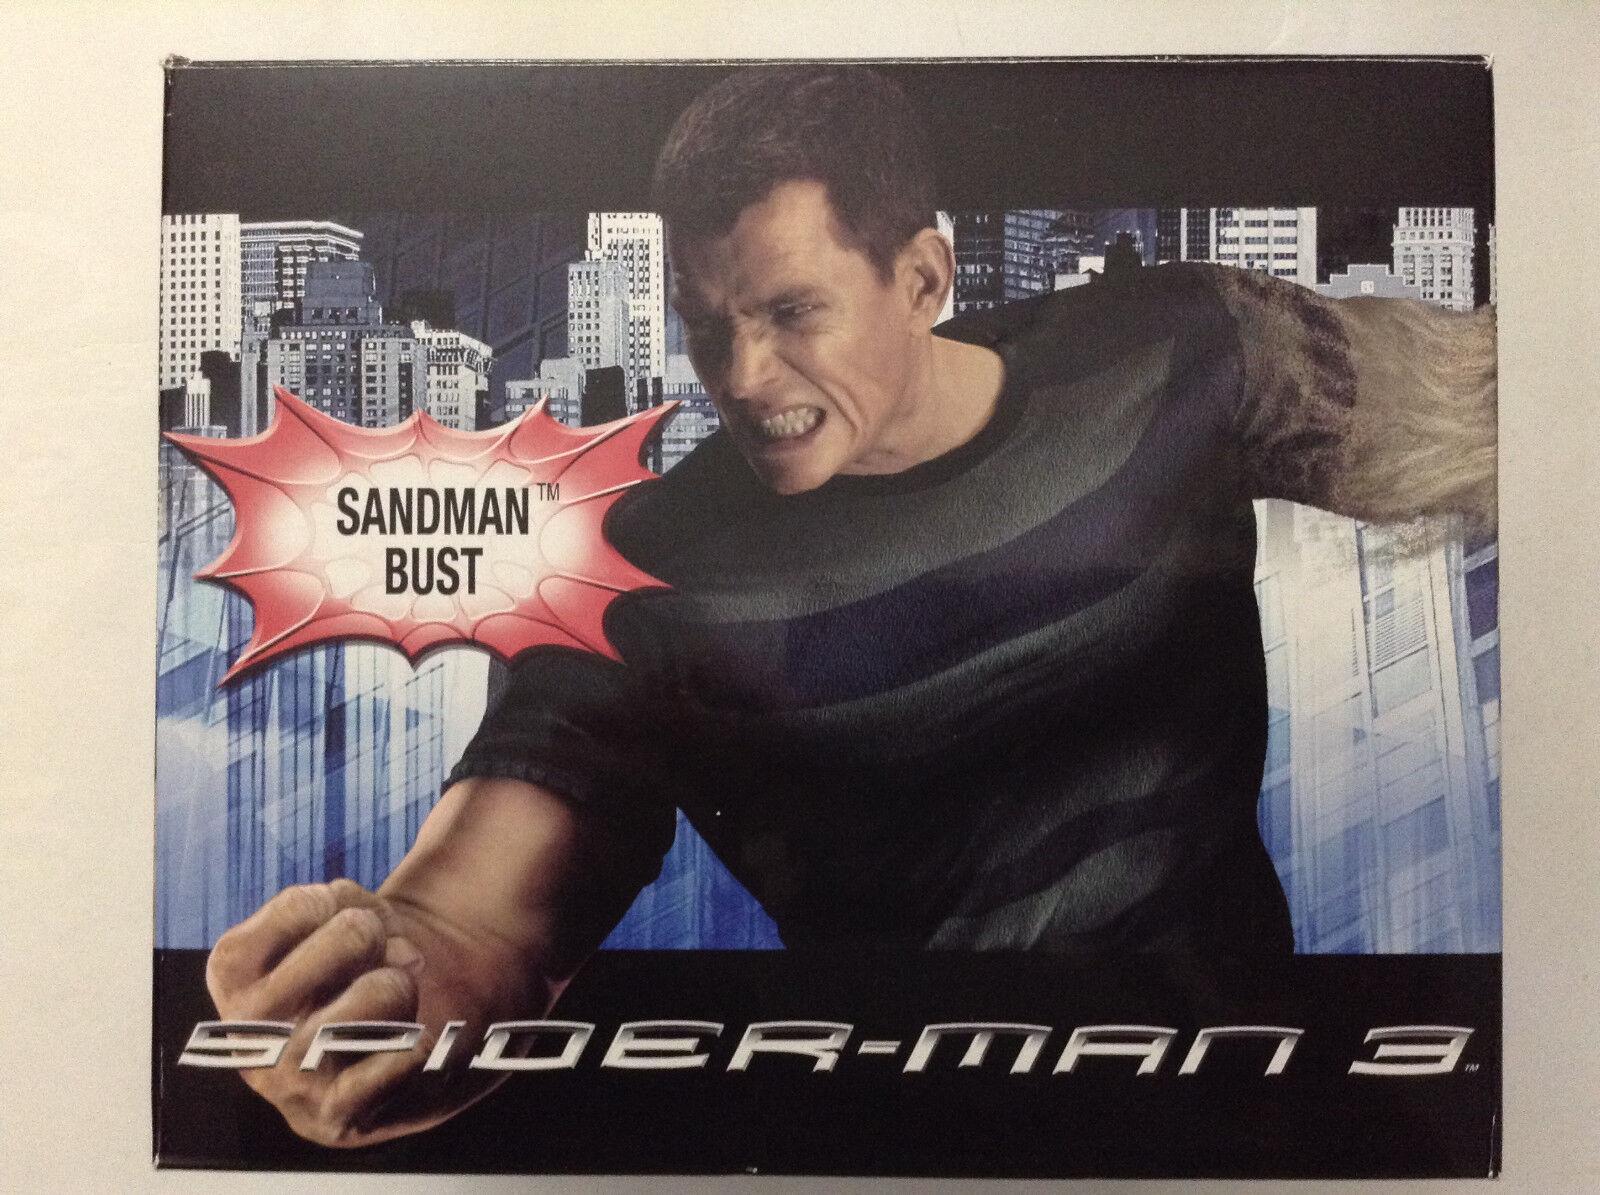 SANDMAN SPIDER-MAN 3 BUST MARVEL MIB DIAMOND SELECT GENTLE GIANT (STATUE 45